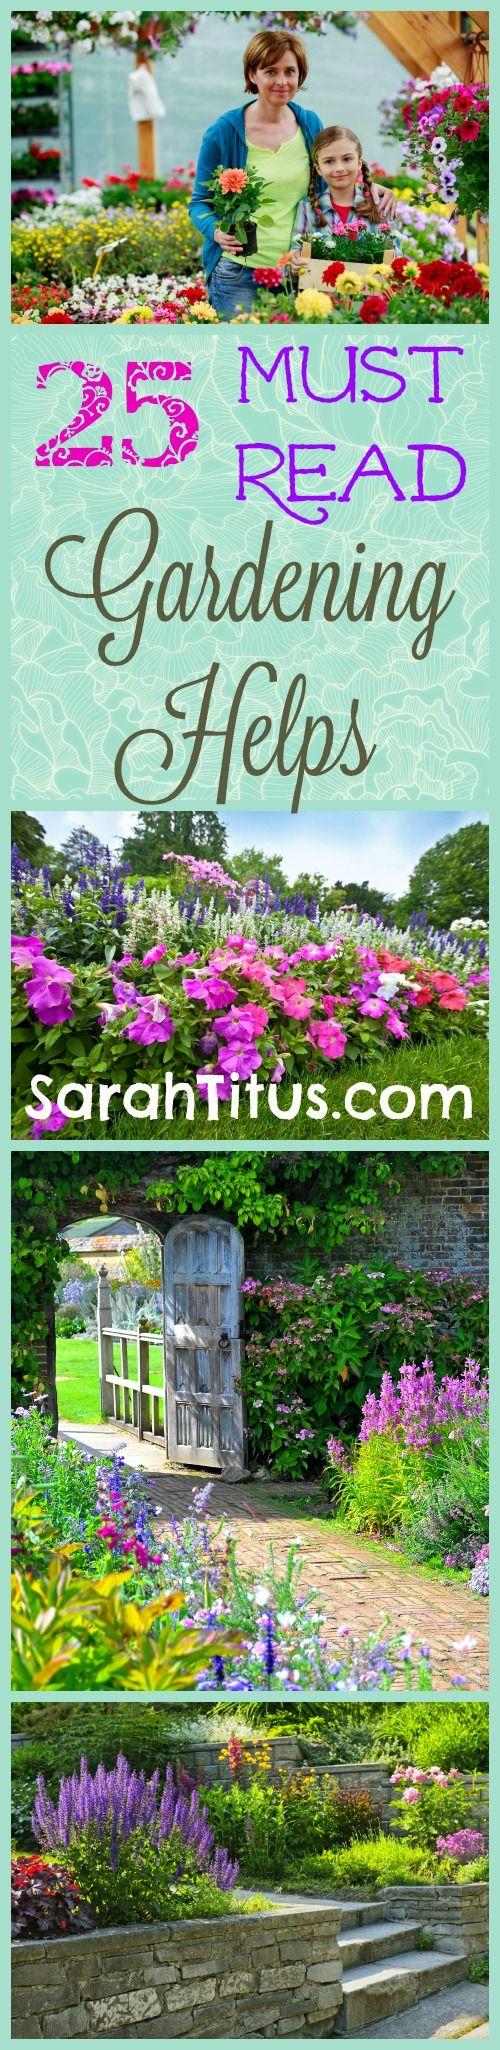 best gardeningoutdoor furniture images on pinterest gardening